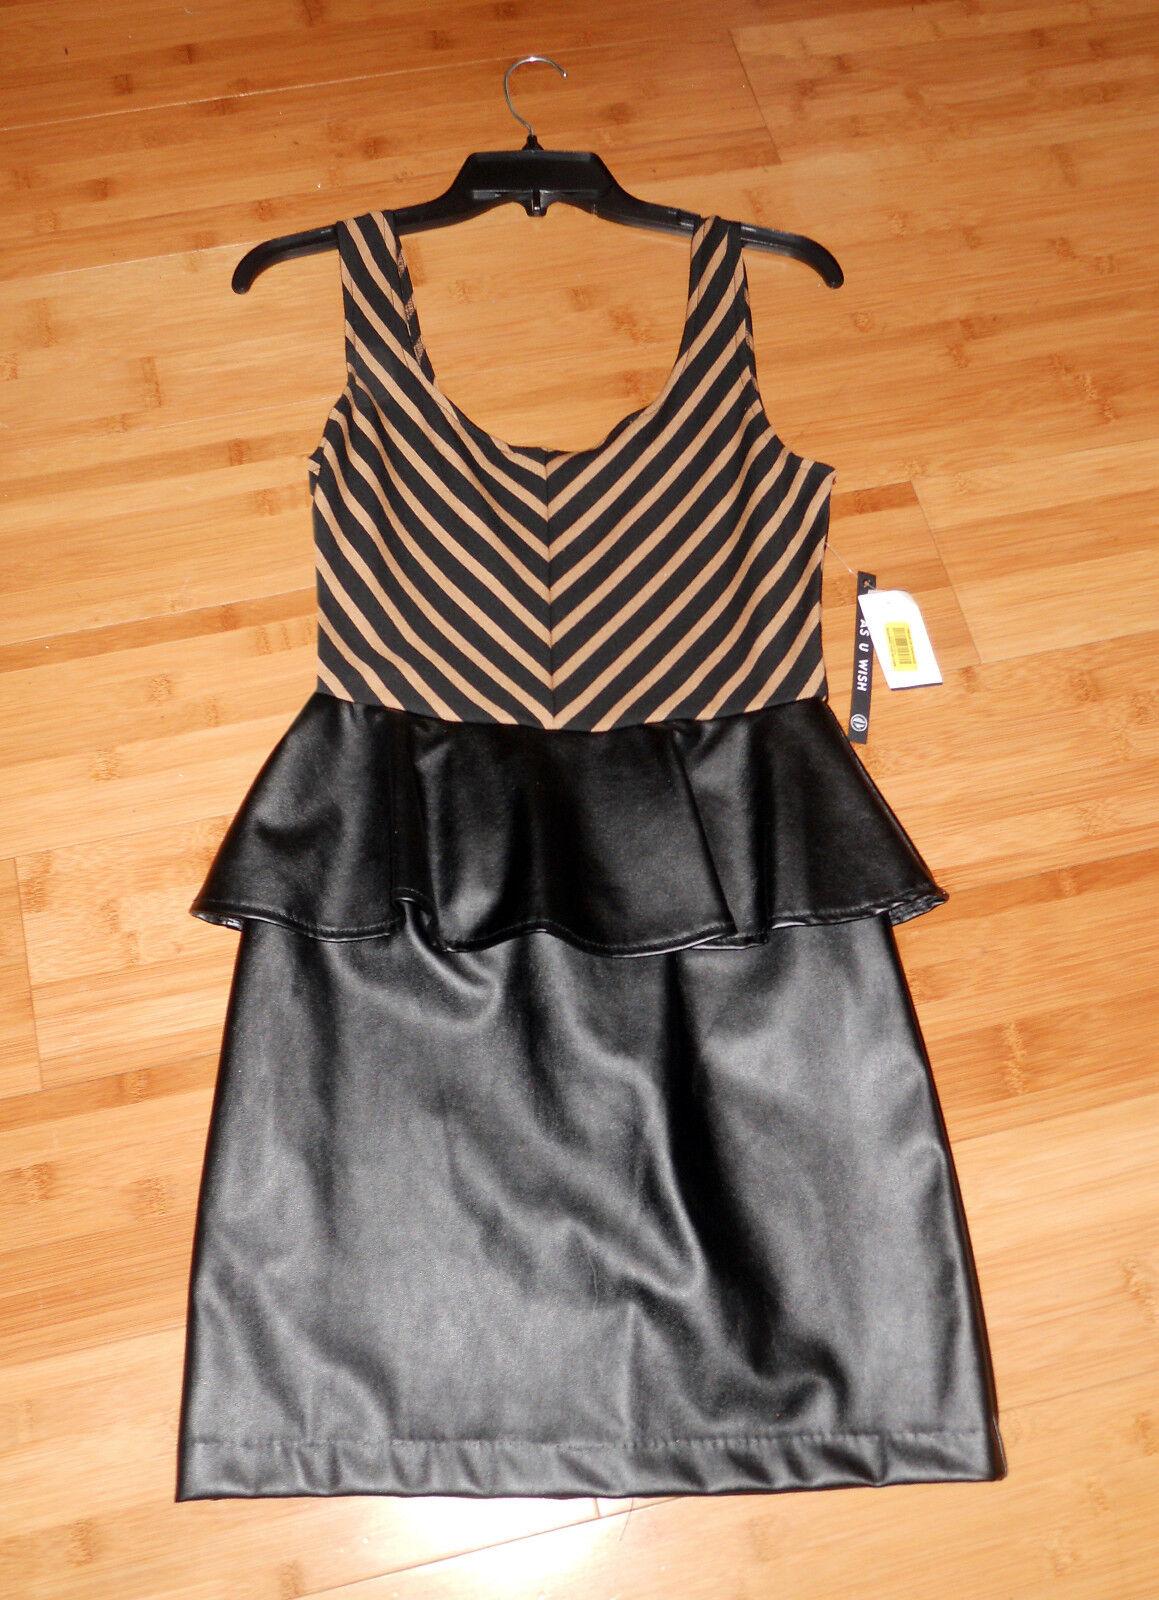 e5245cb5b Black/Brown leather look/feel NICE Style Dress-Sz Small Jr. NEW w/Tags  DILLARDS